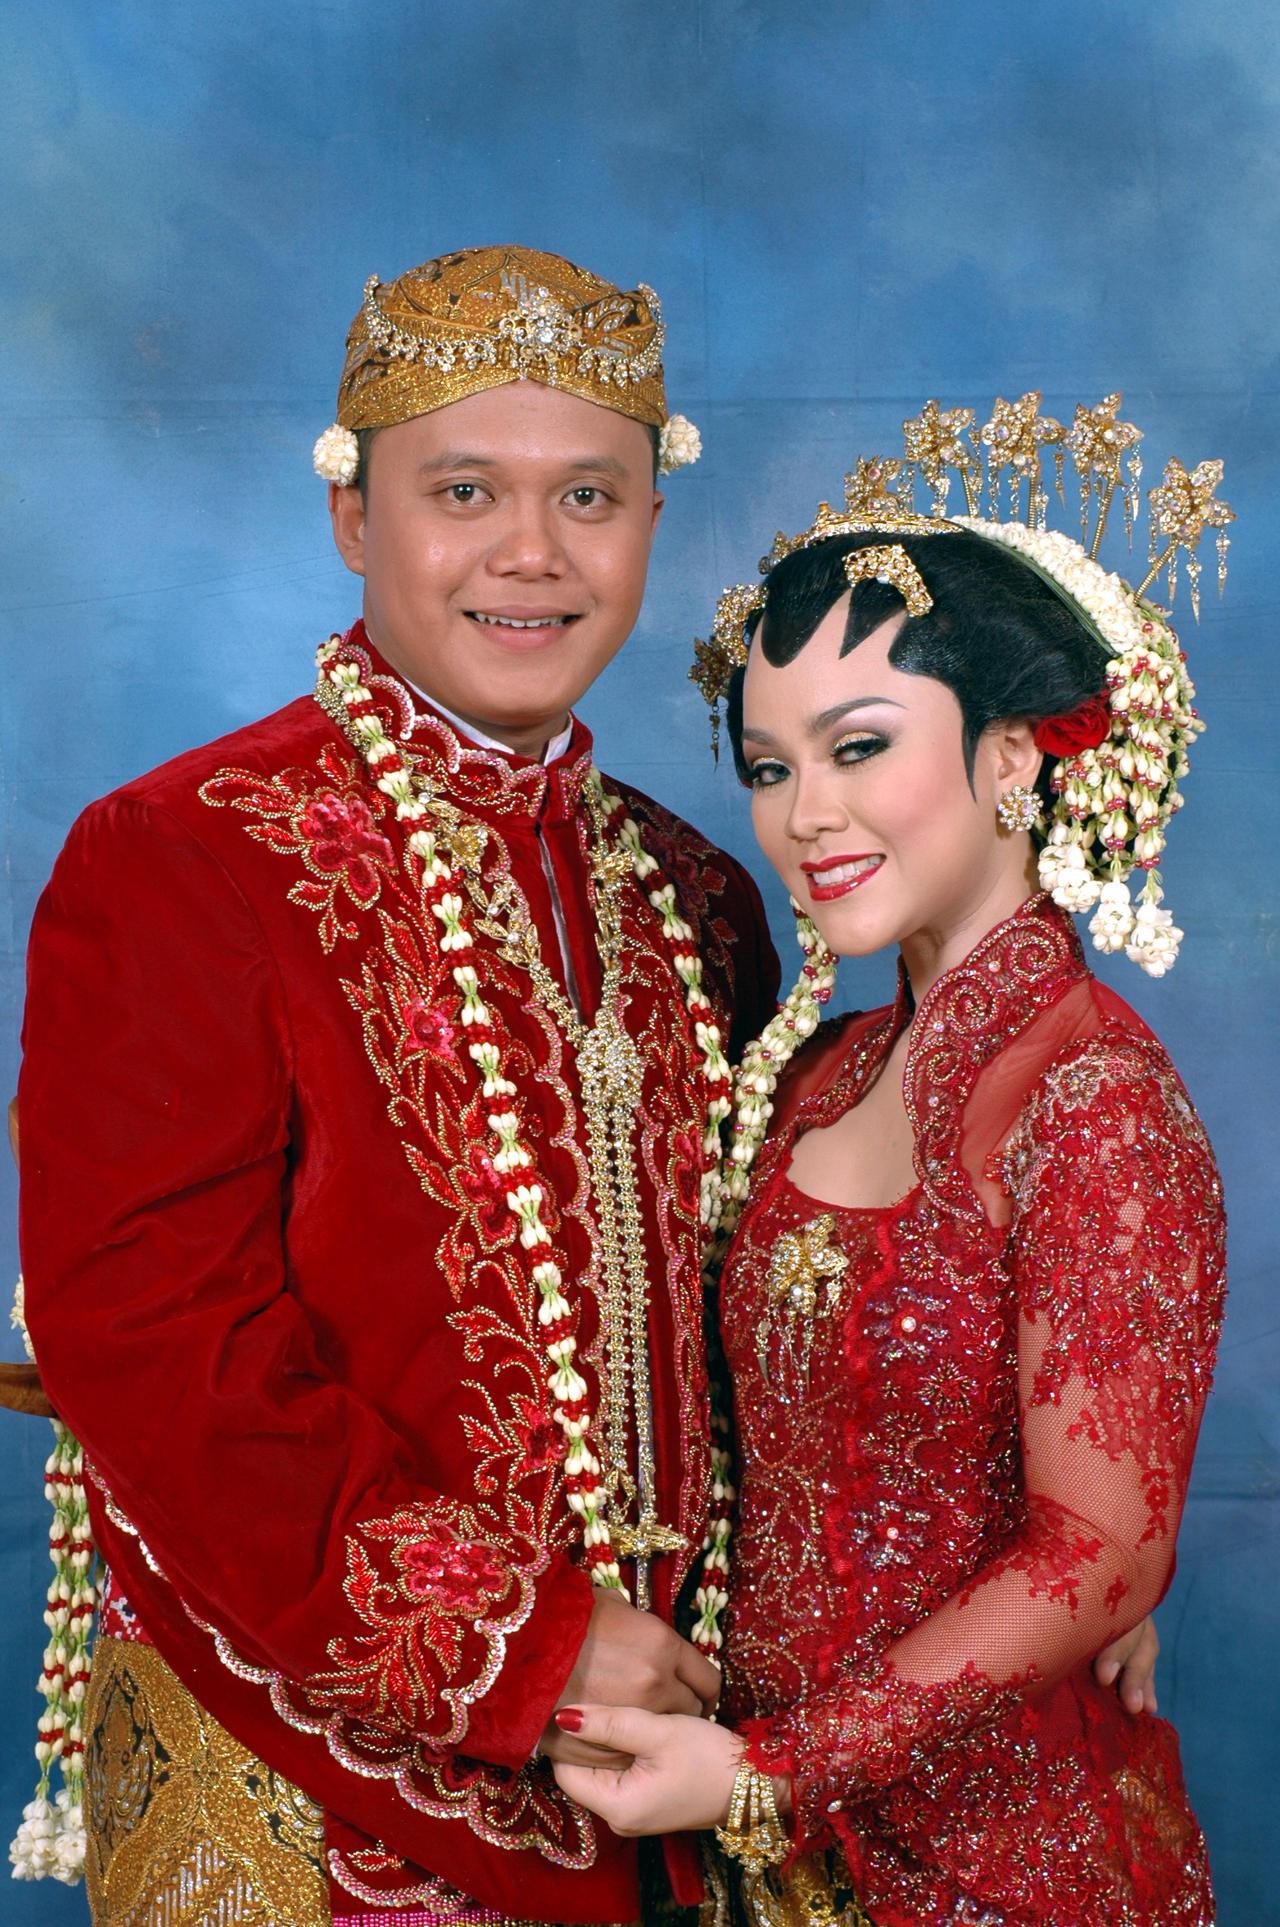 Javanese Wedding   newhairstylesformen2014.com - 740.4KB